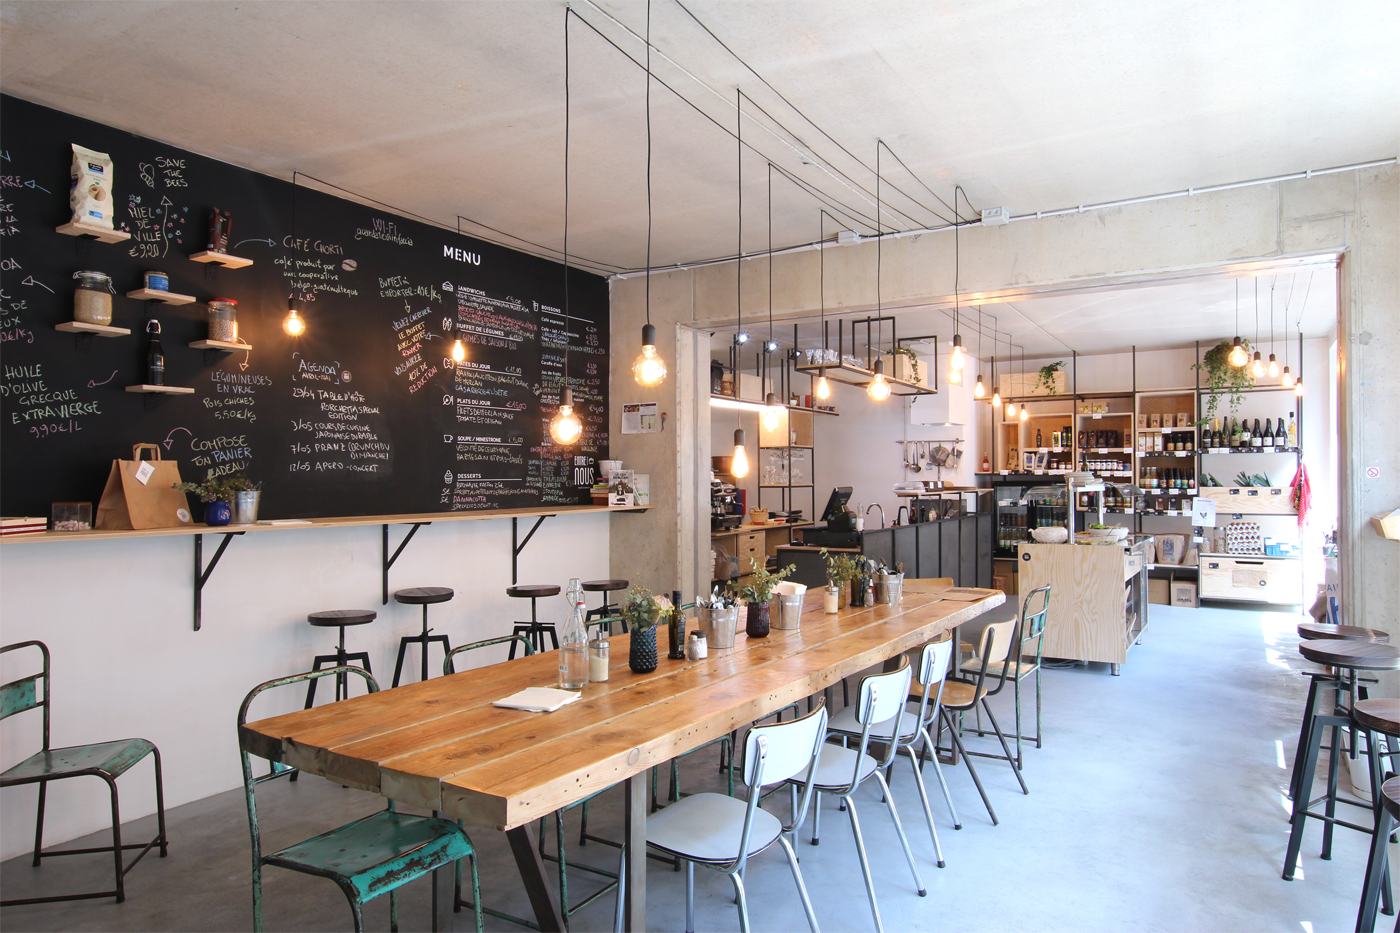 sustainable restaurant furniture. Sustainable Neapolitan Food Restaurant Furniture